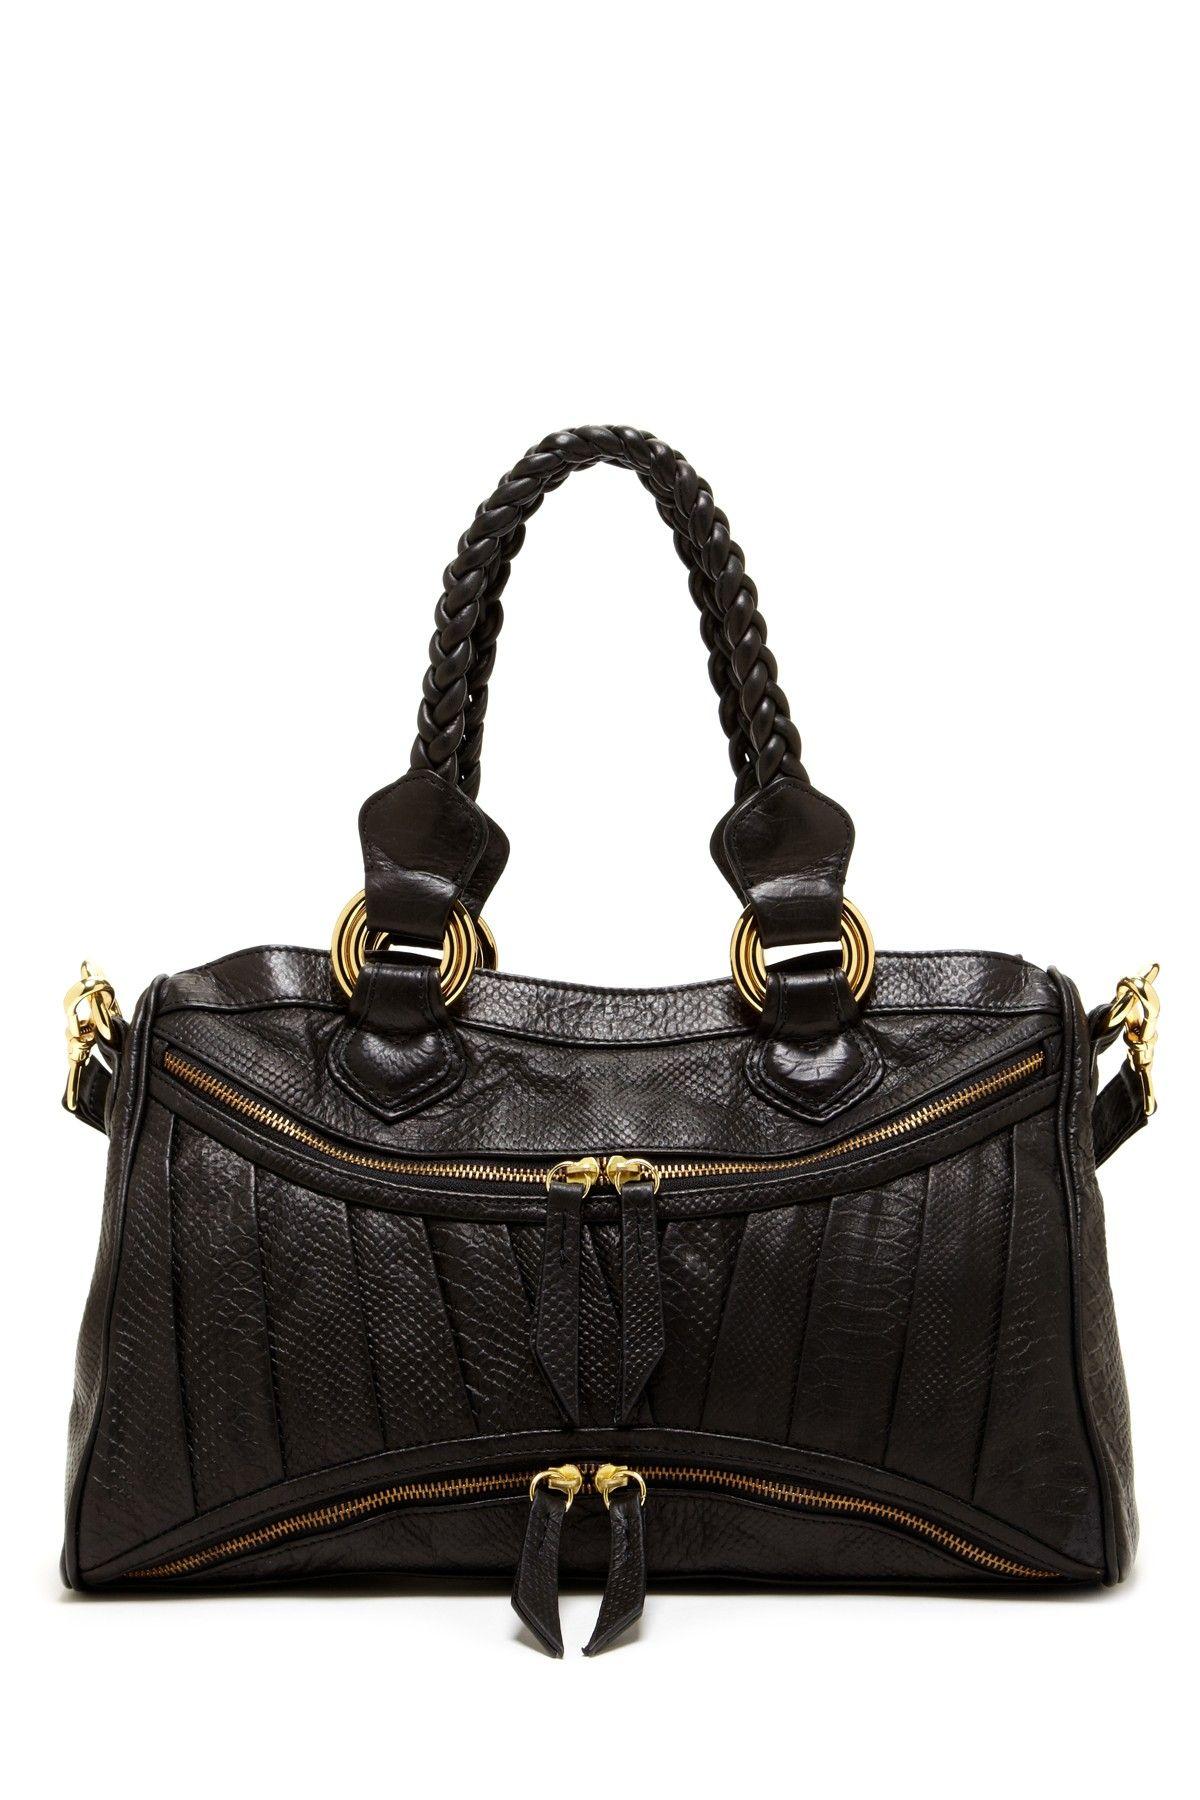 Treesje Handbags Asher Shoulder Bag